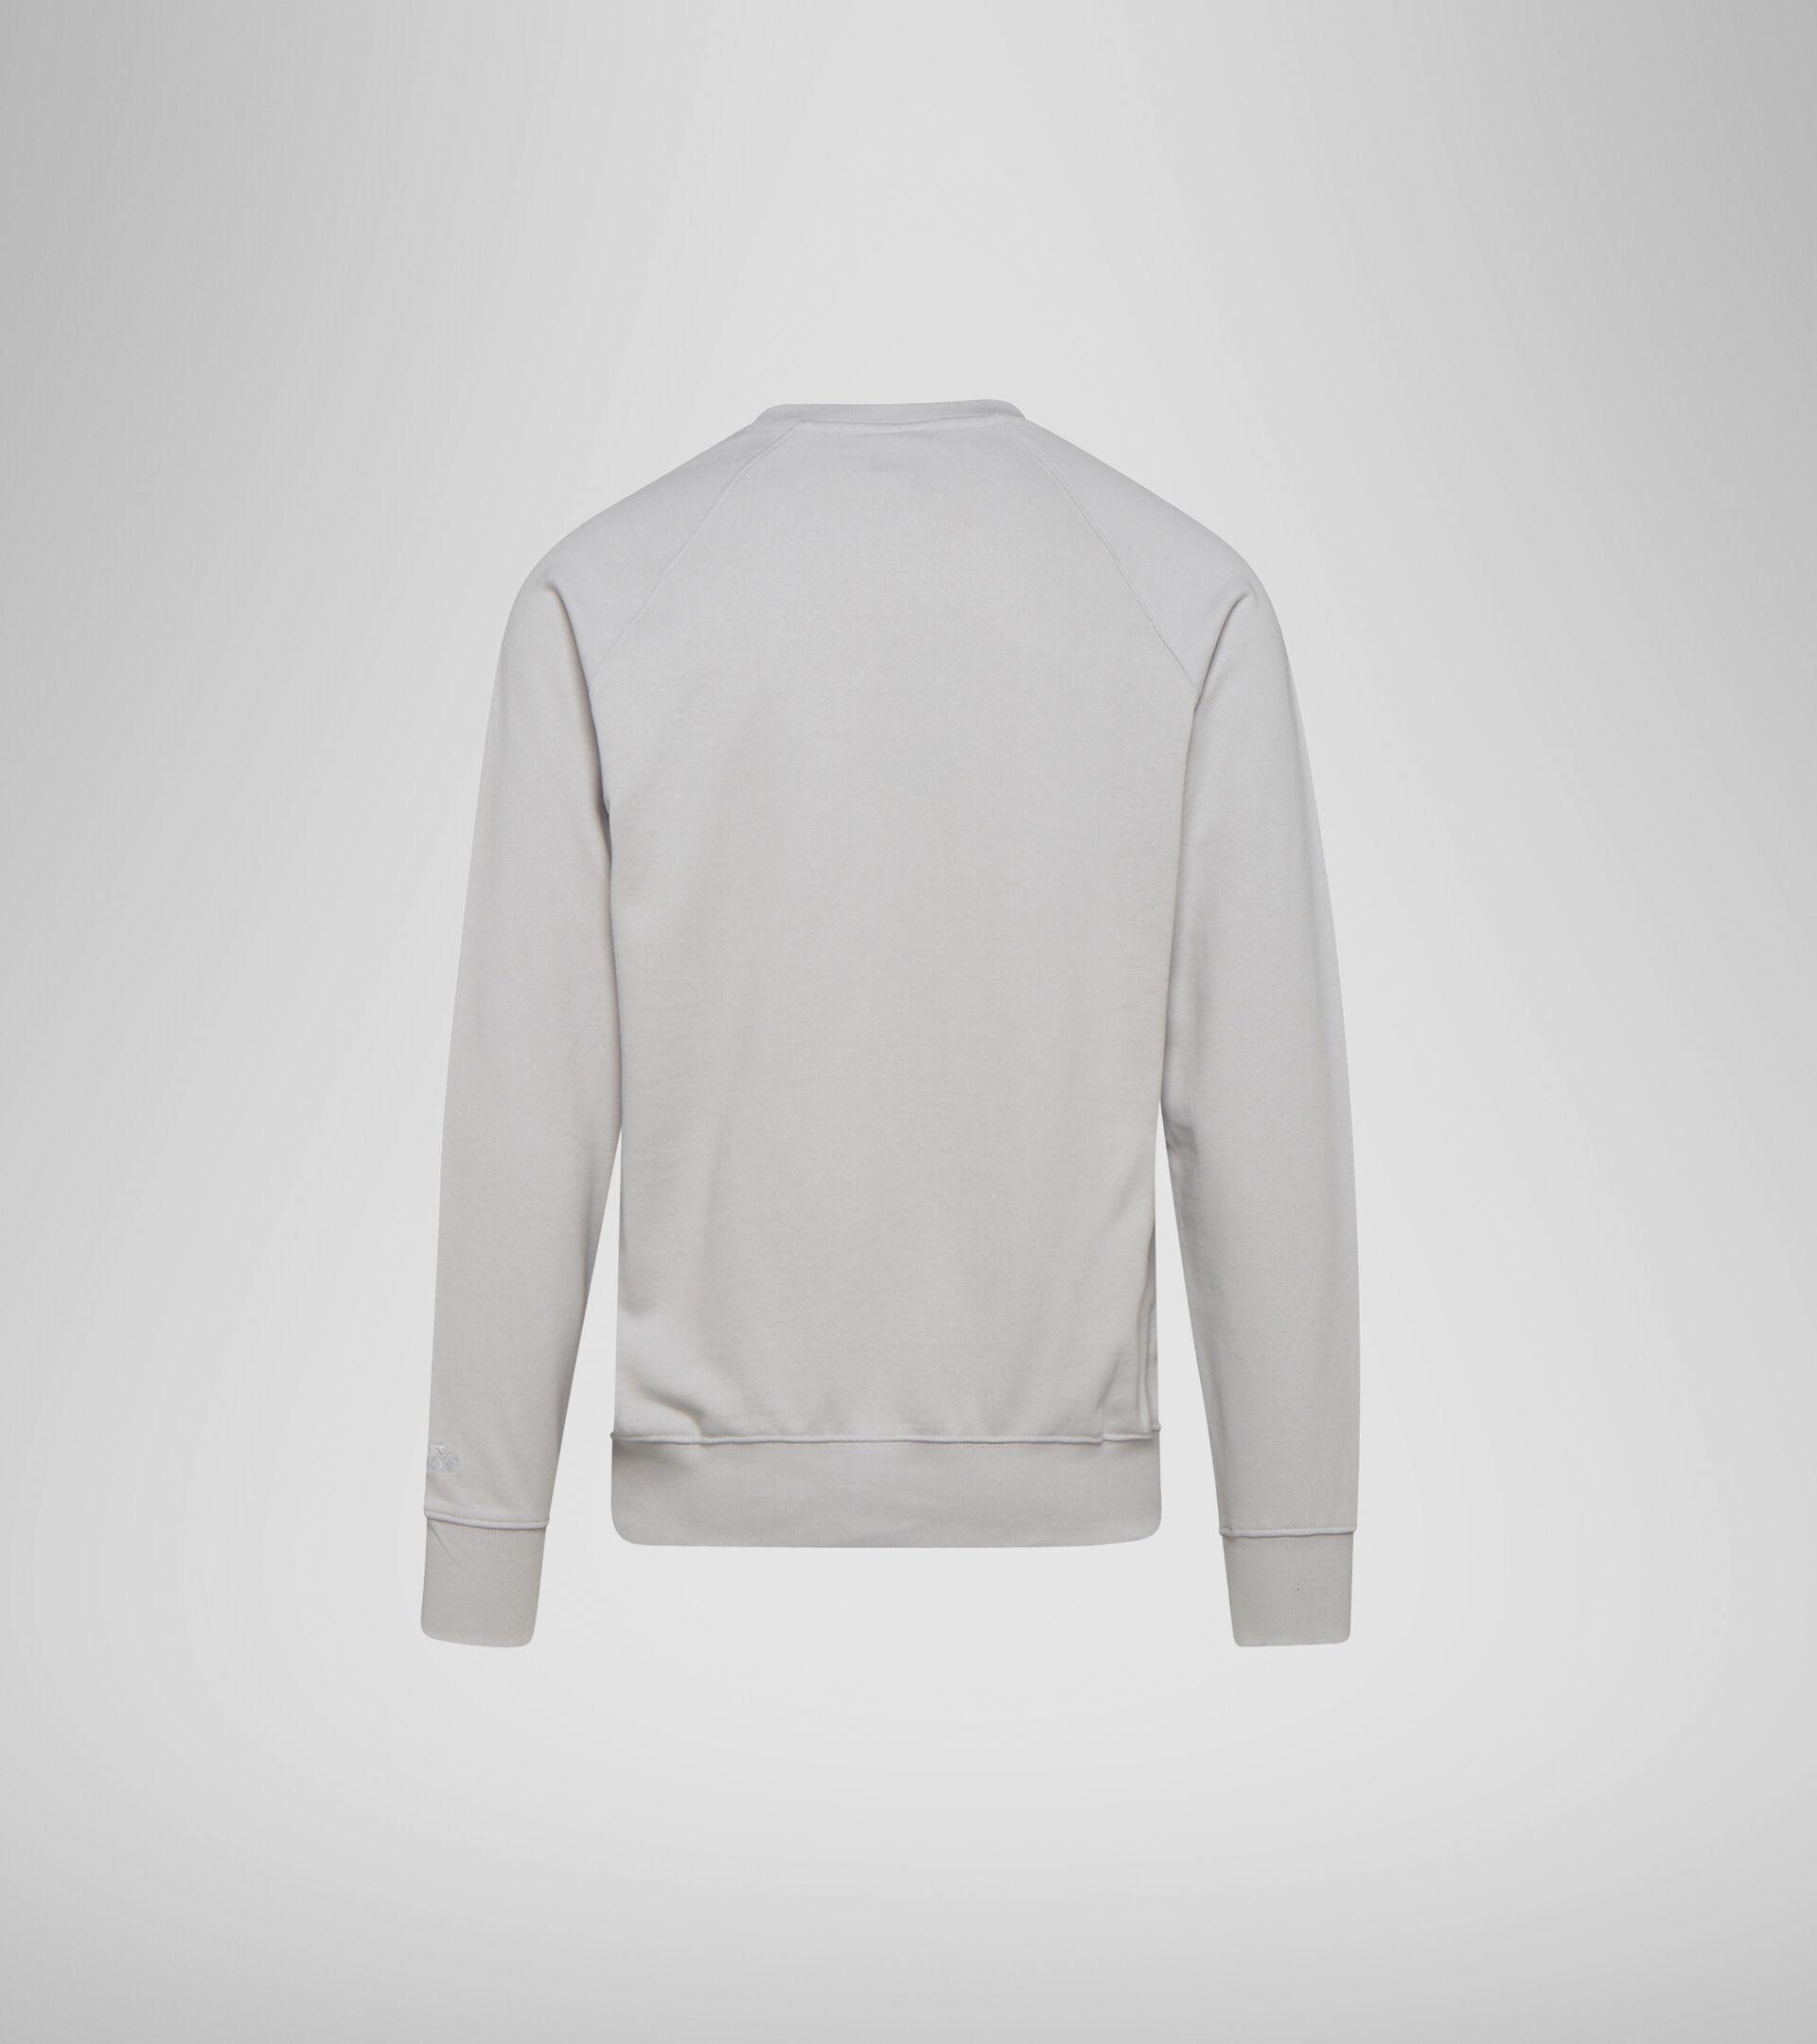 Apparel Sportswear UOMO SWEATSHIRT CREW SPECTRA OYSTER MUSHROOM Diadora